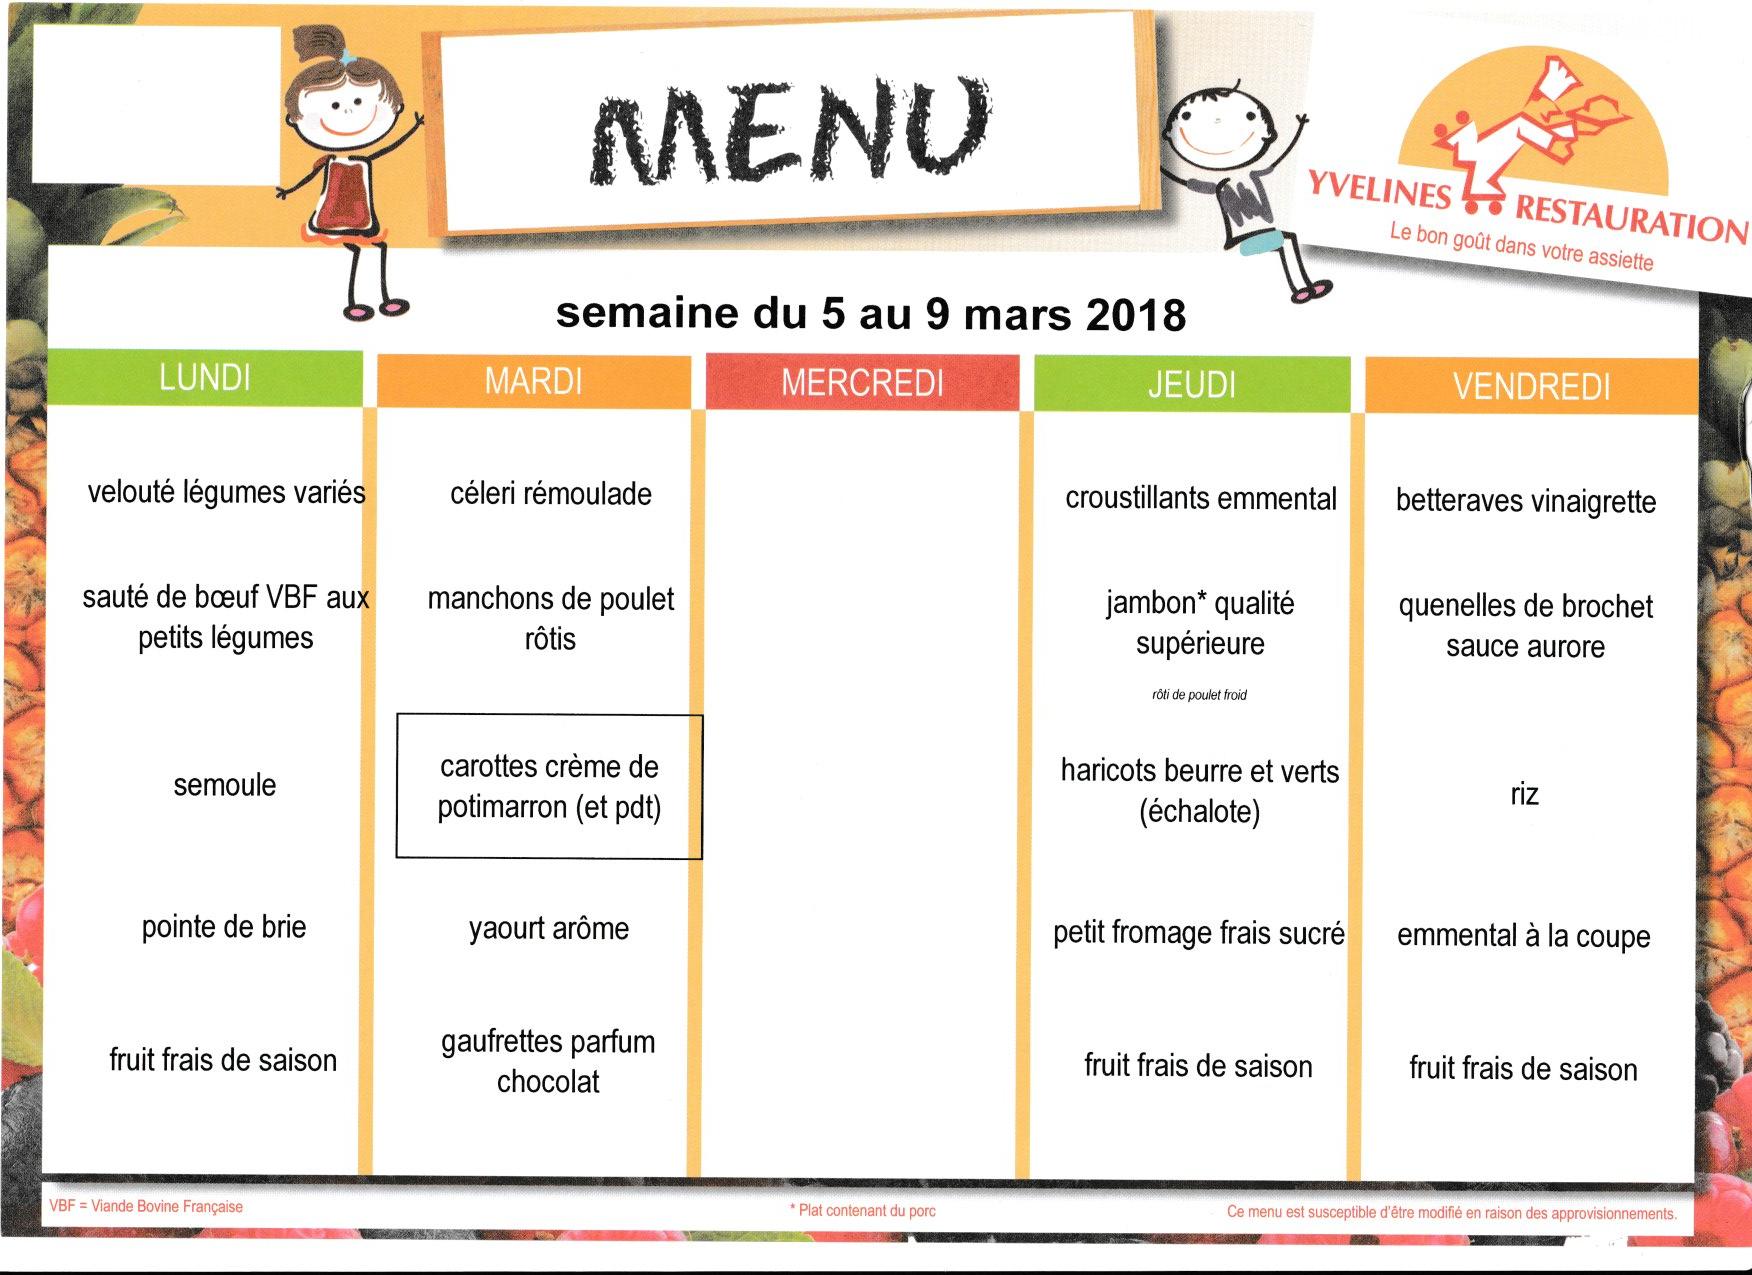 menu du 5 au 9 mars